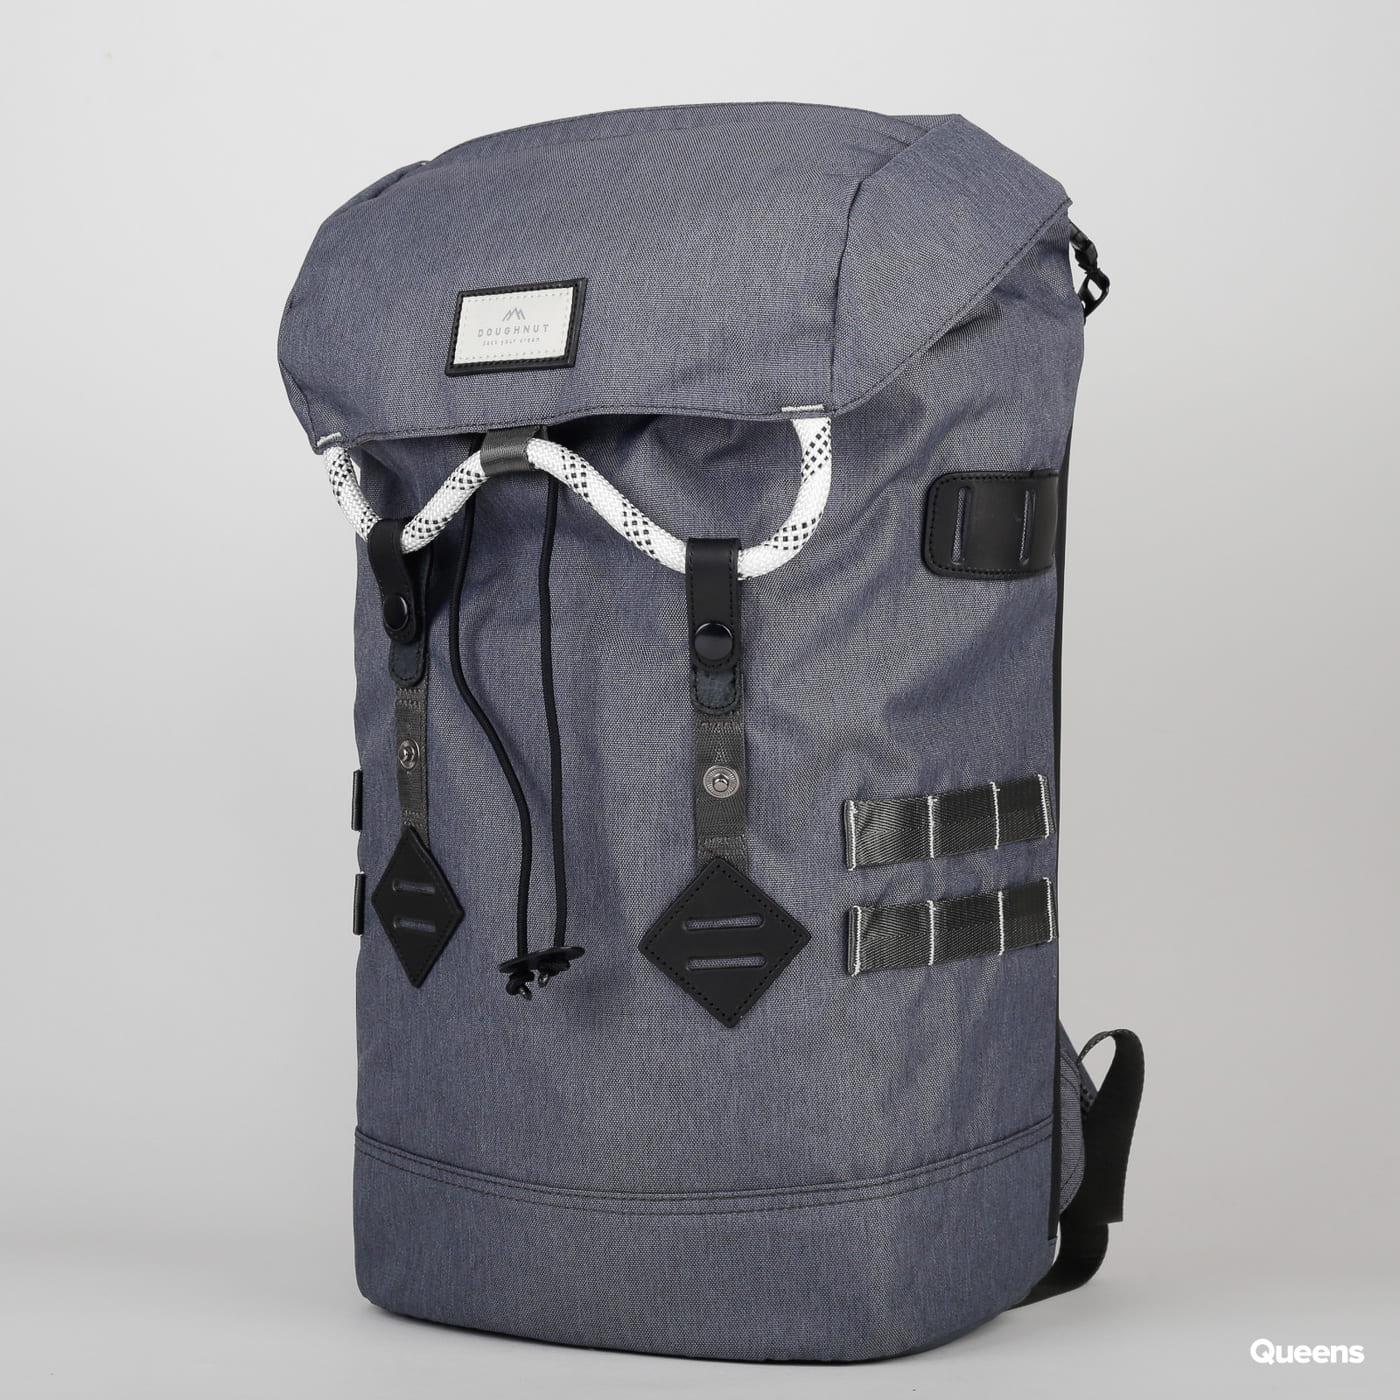 Doughnut Colorado Accents Series Backpack dunkelgrau